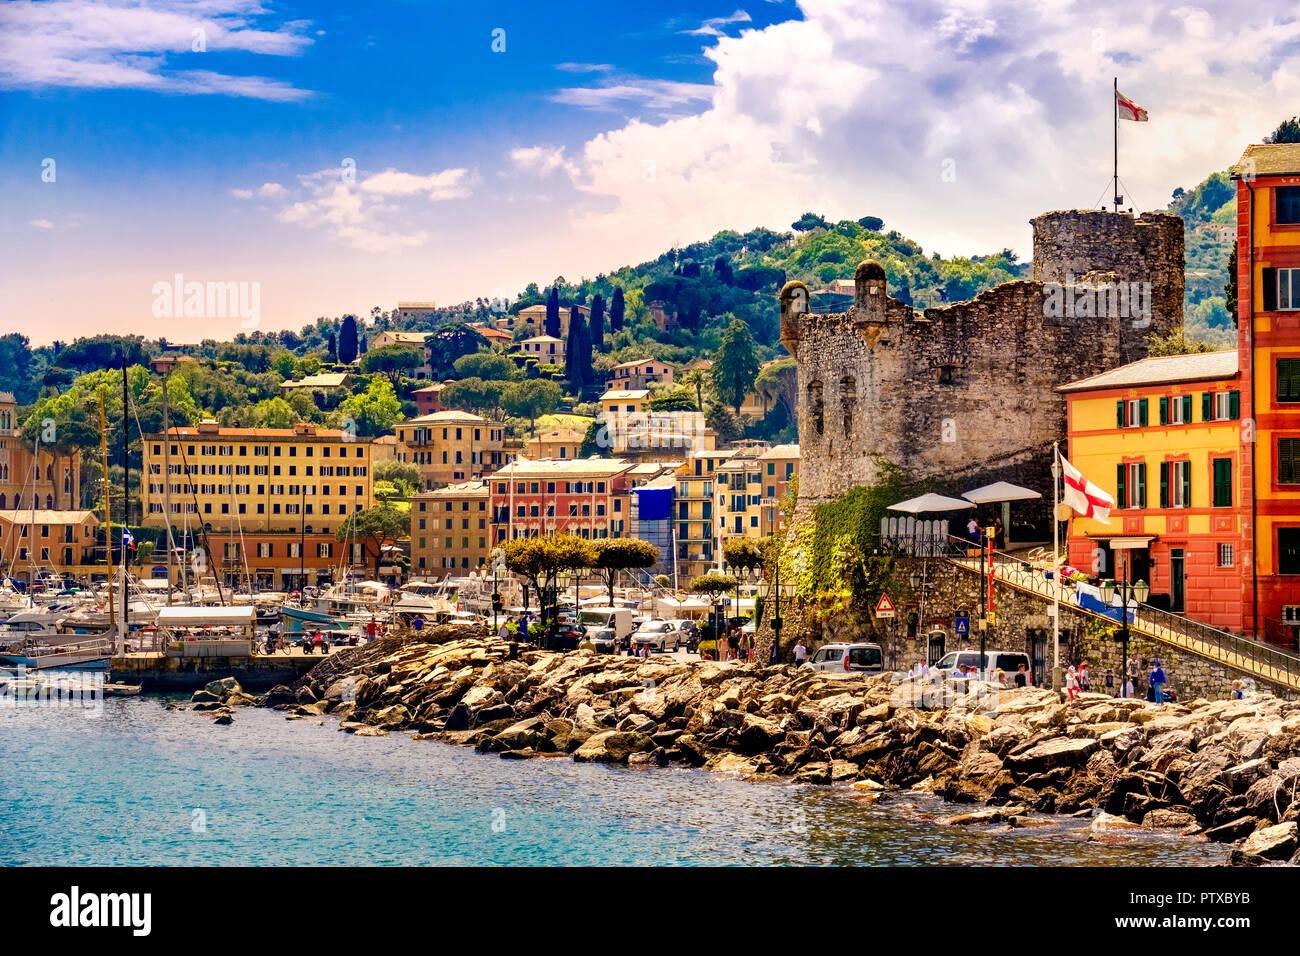 Italienische Riviera Landschaft Santa Margherita Ligure schloss Italien Stockbild